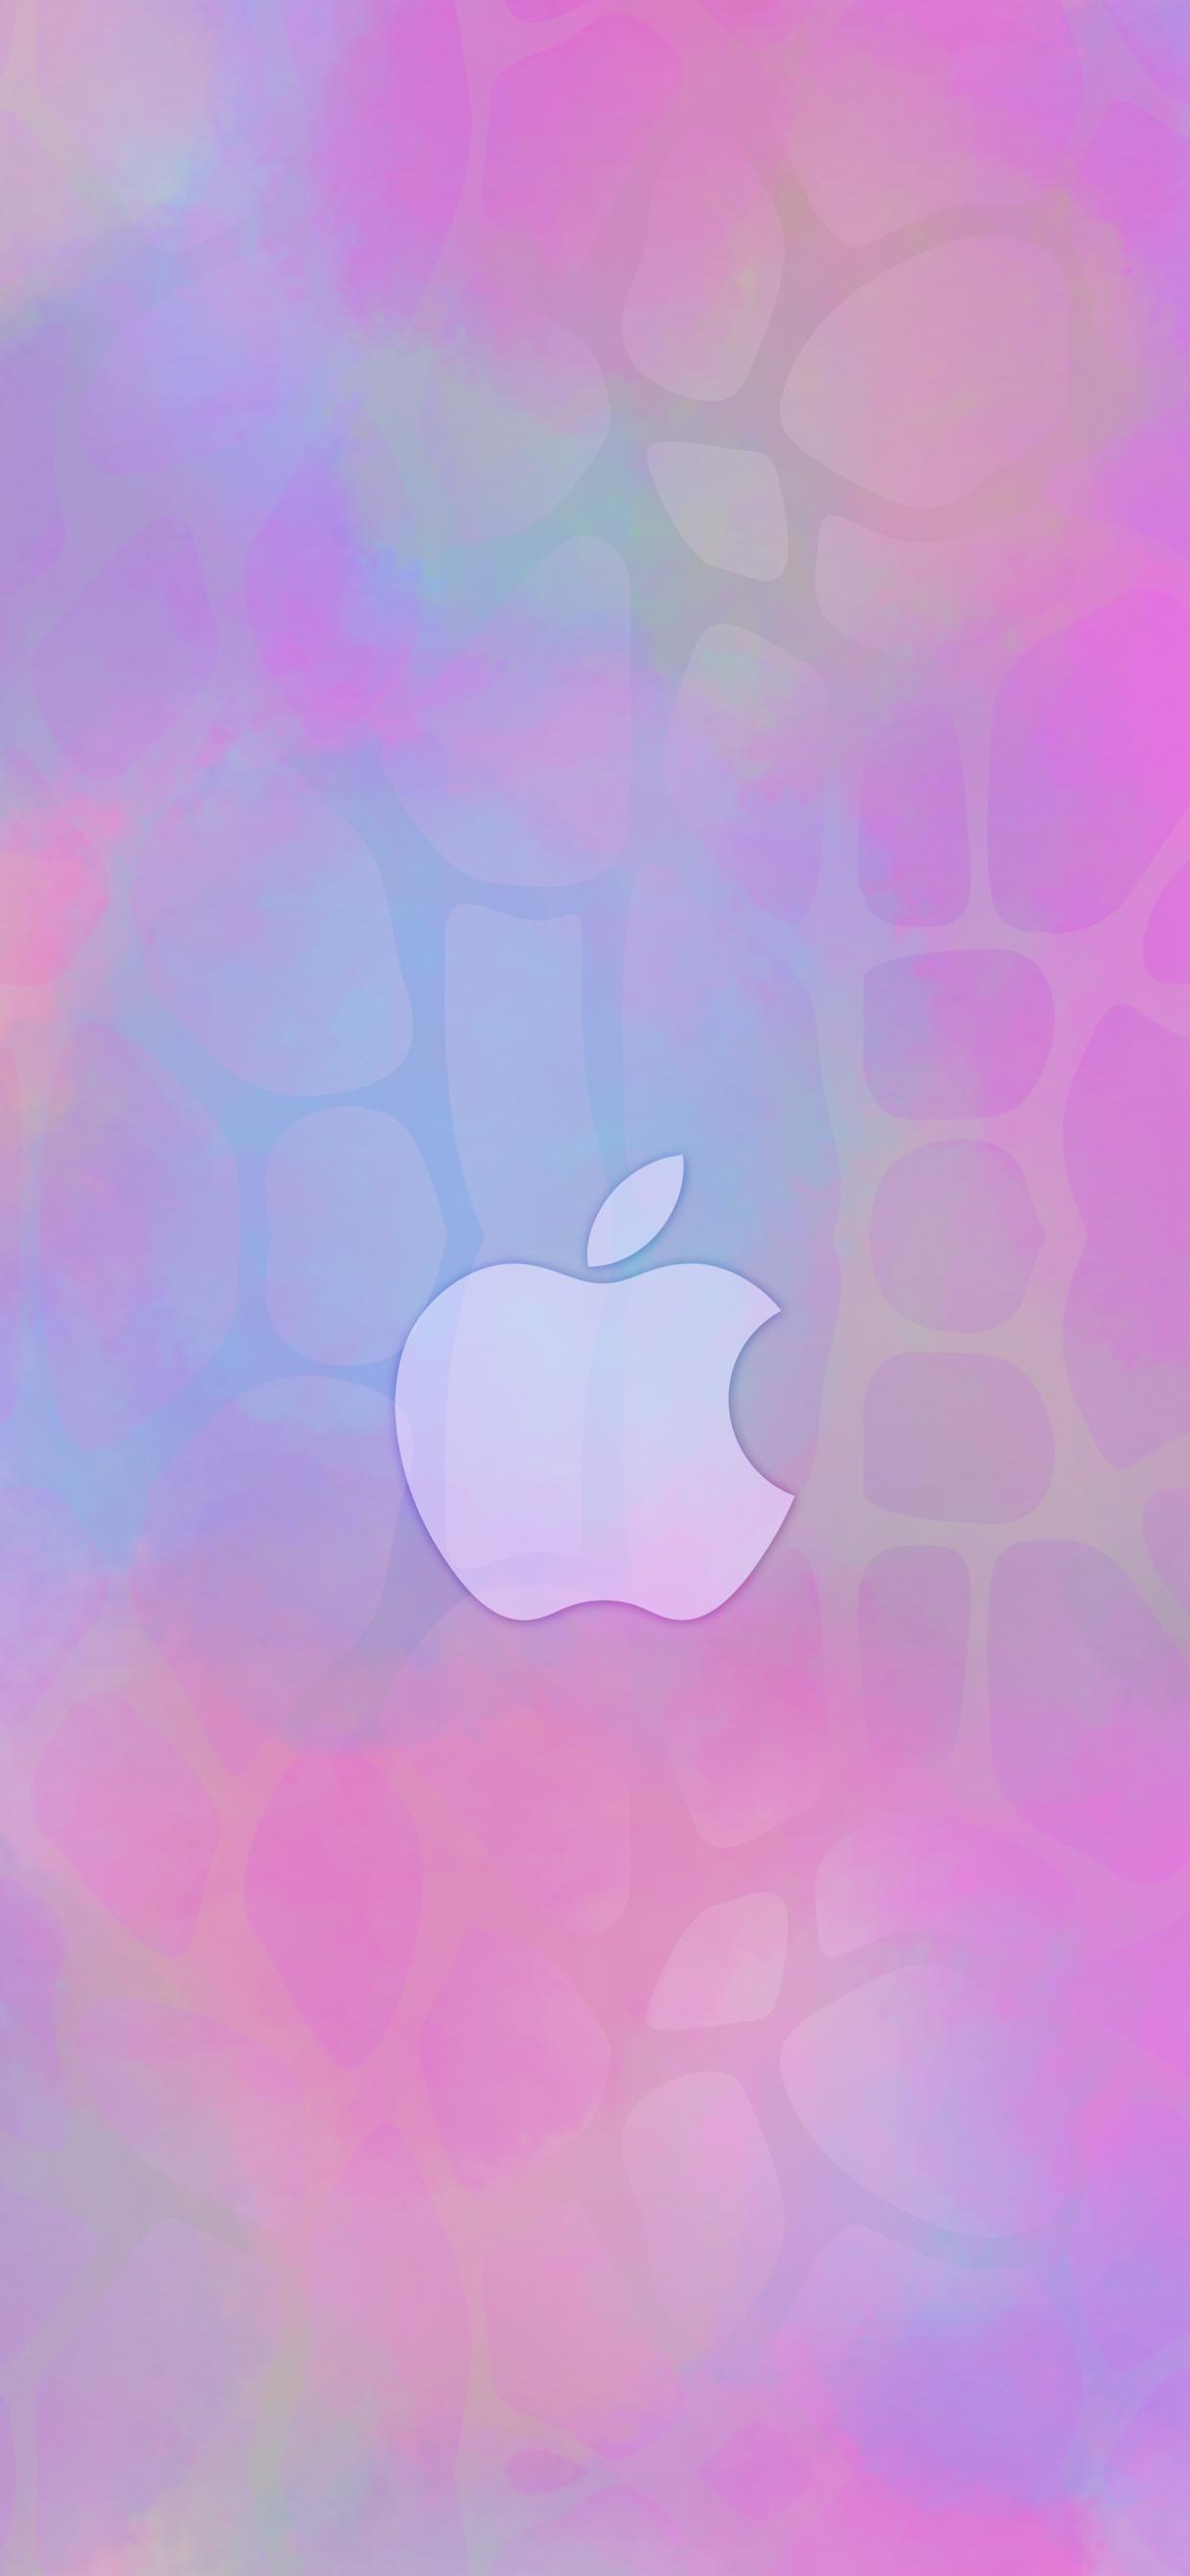 Rainbow Apple Wallpaper Apple Wallpaper Apple Logo Wallpaper Iphone Wallpaper Iphone Cute